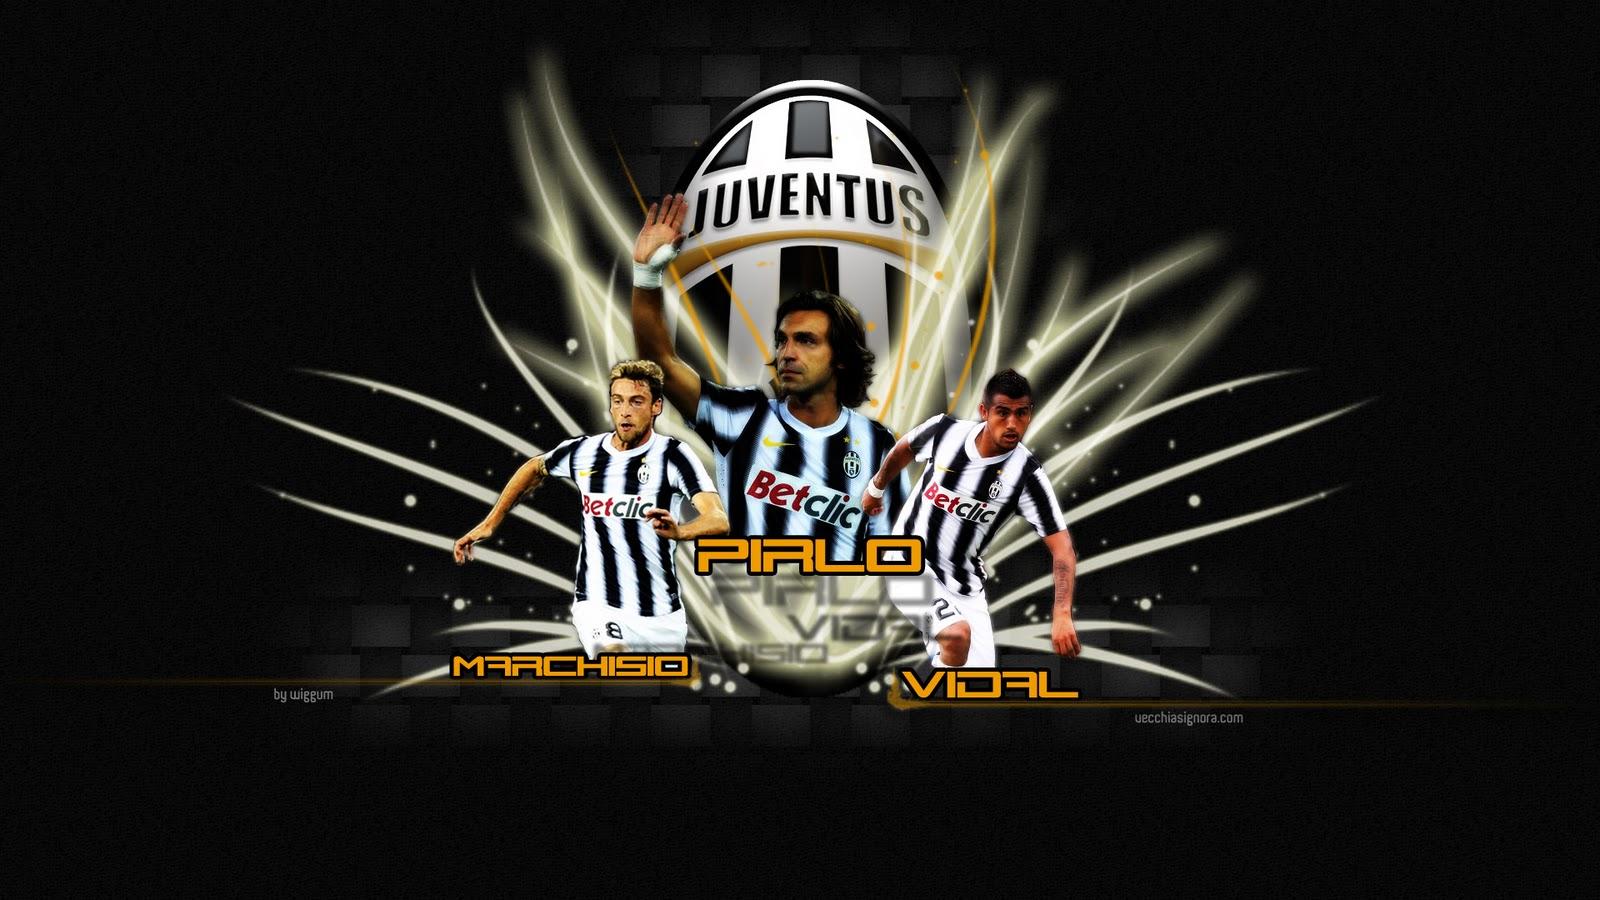 http://4.bp.blogspot.com/-Q3VUXQ_JT14/TpGtgD980wI/AAAAAAAADpk/wHmisYAe_dE/s1600/Pirlo_Marchisio_Vidal_wallpaper_Juve.jpg